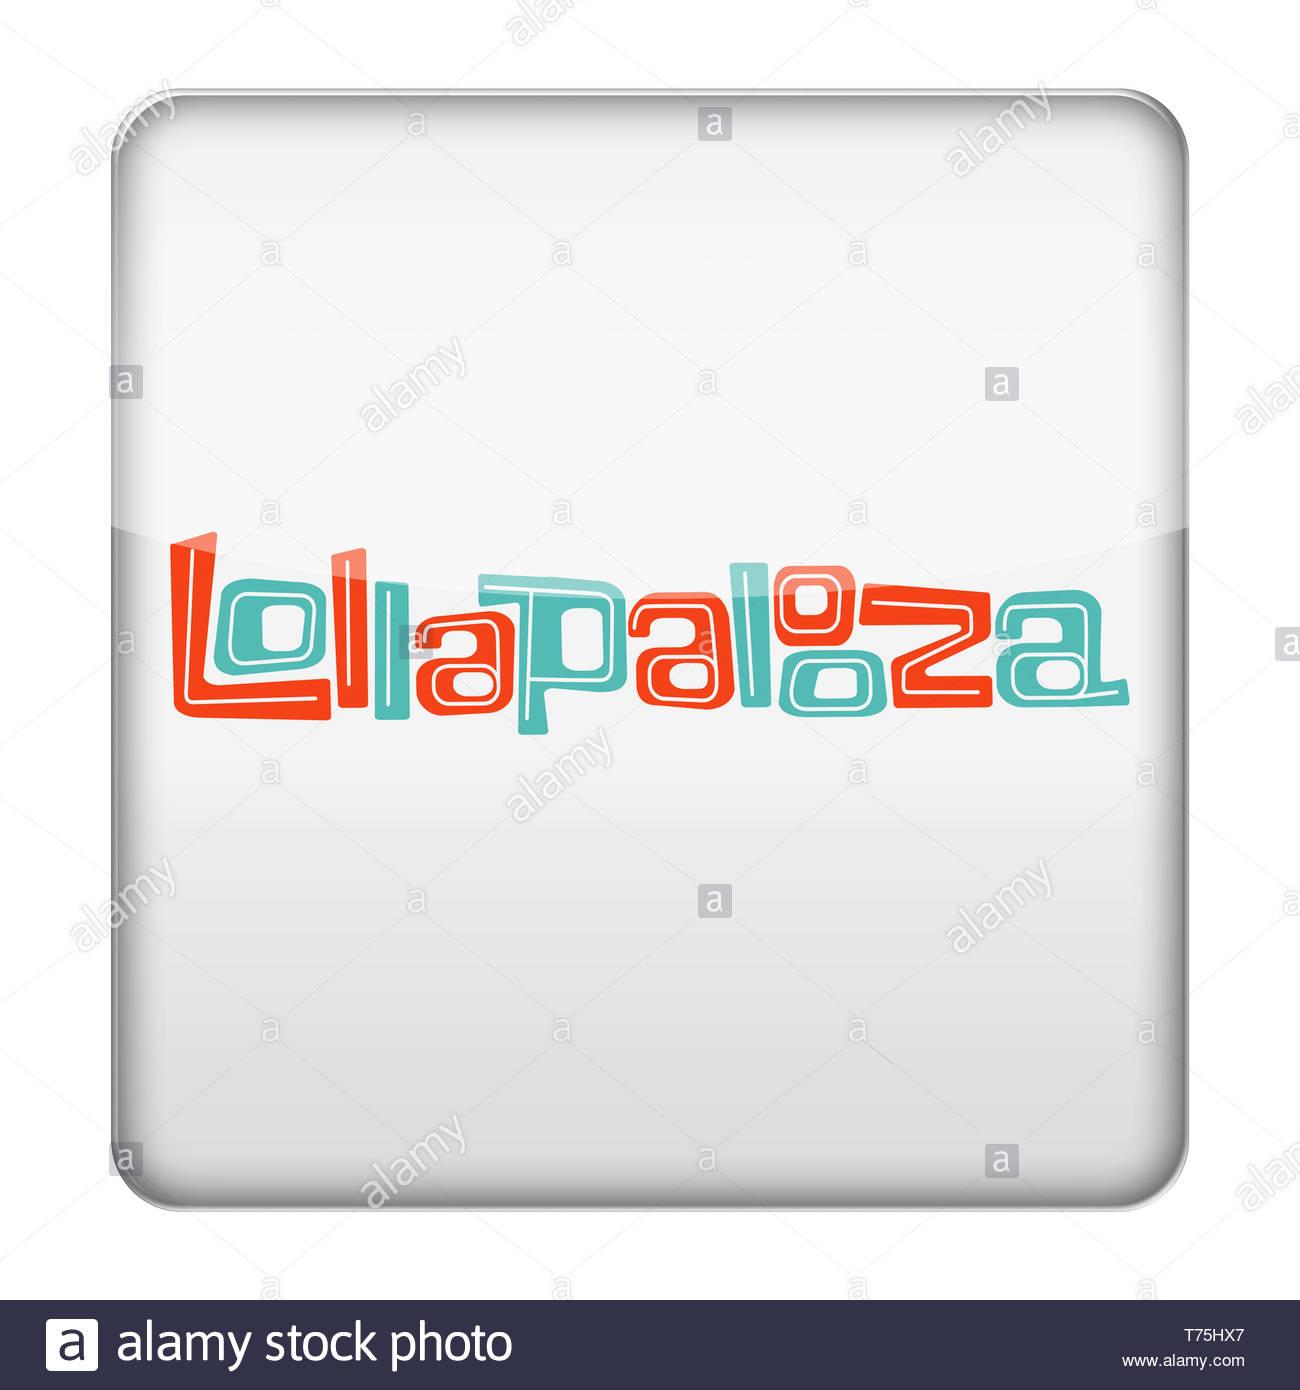 Lollapalooza music festival logo - Stock Image